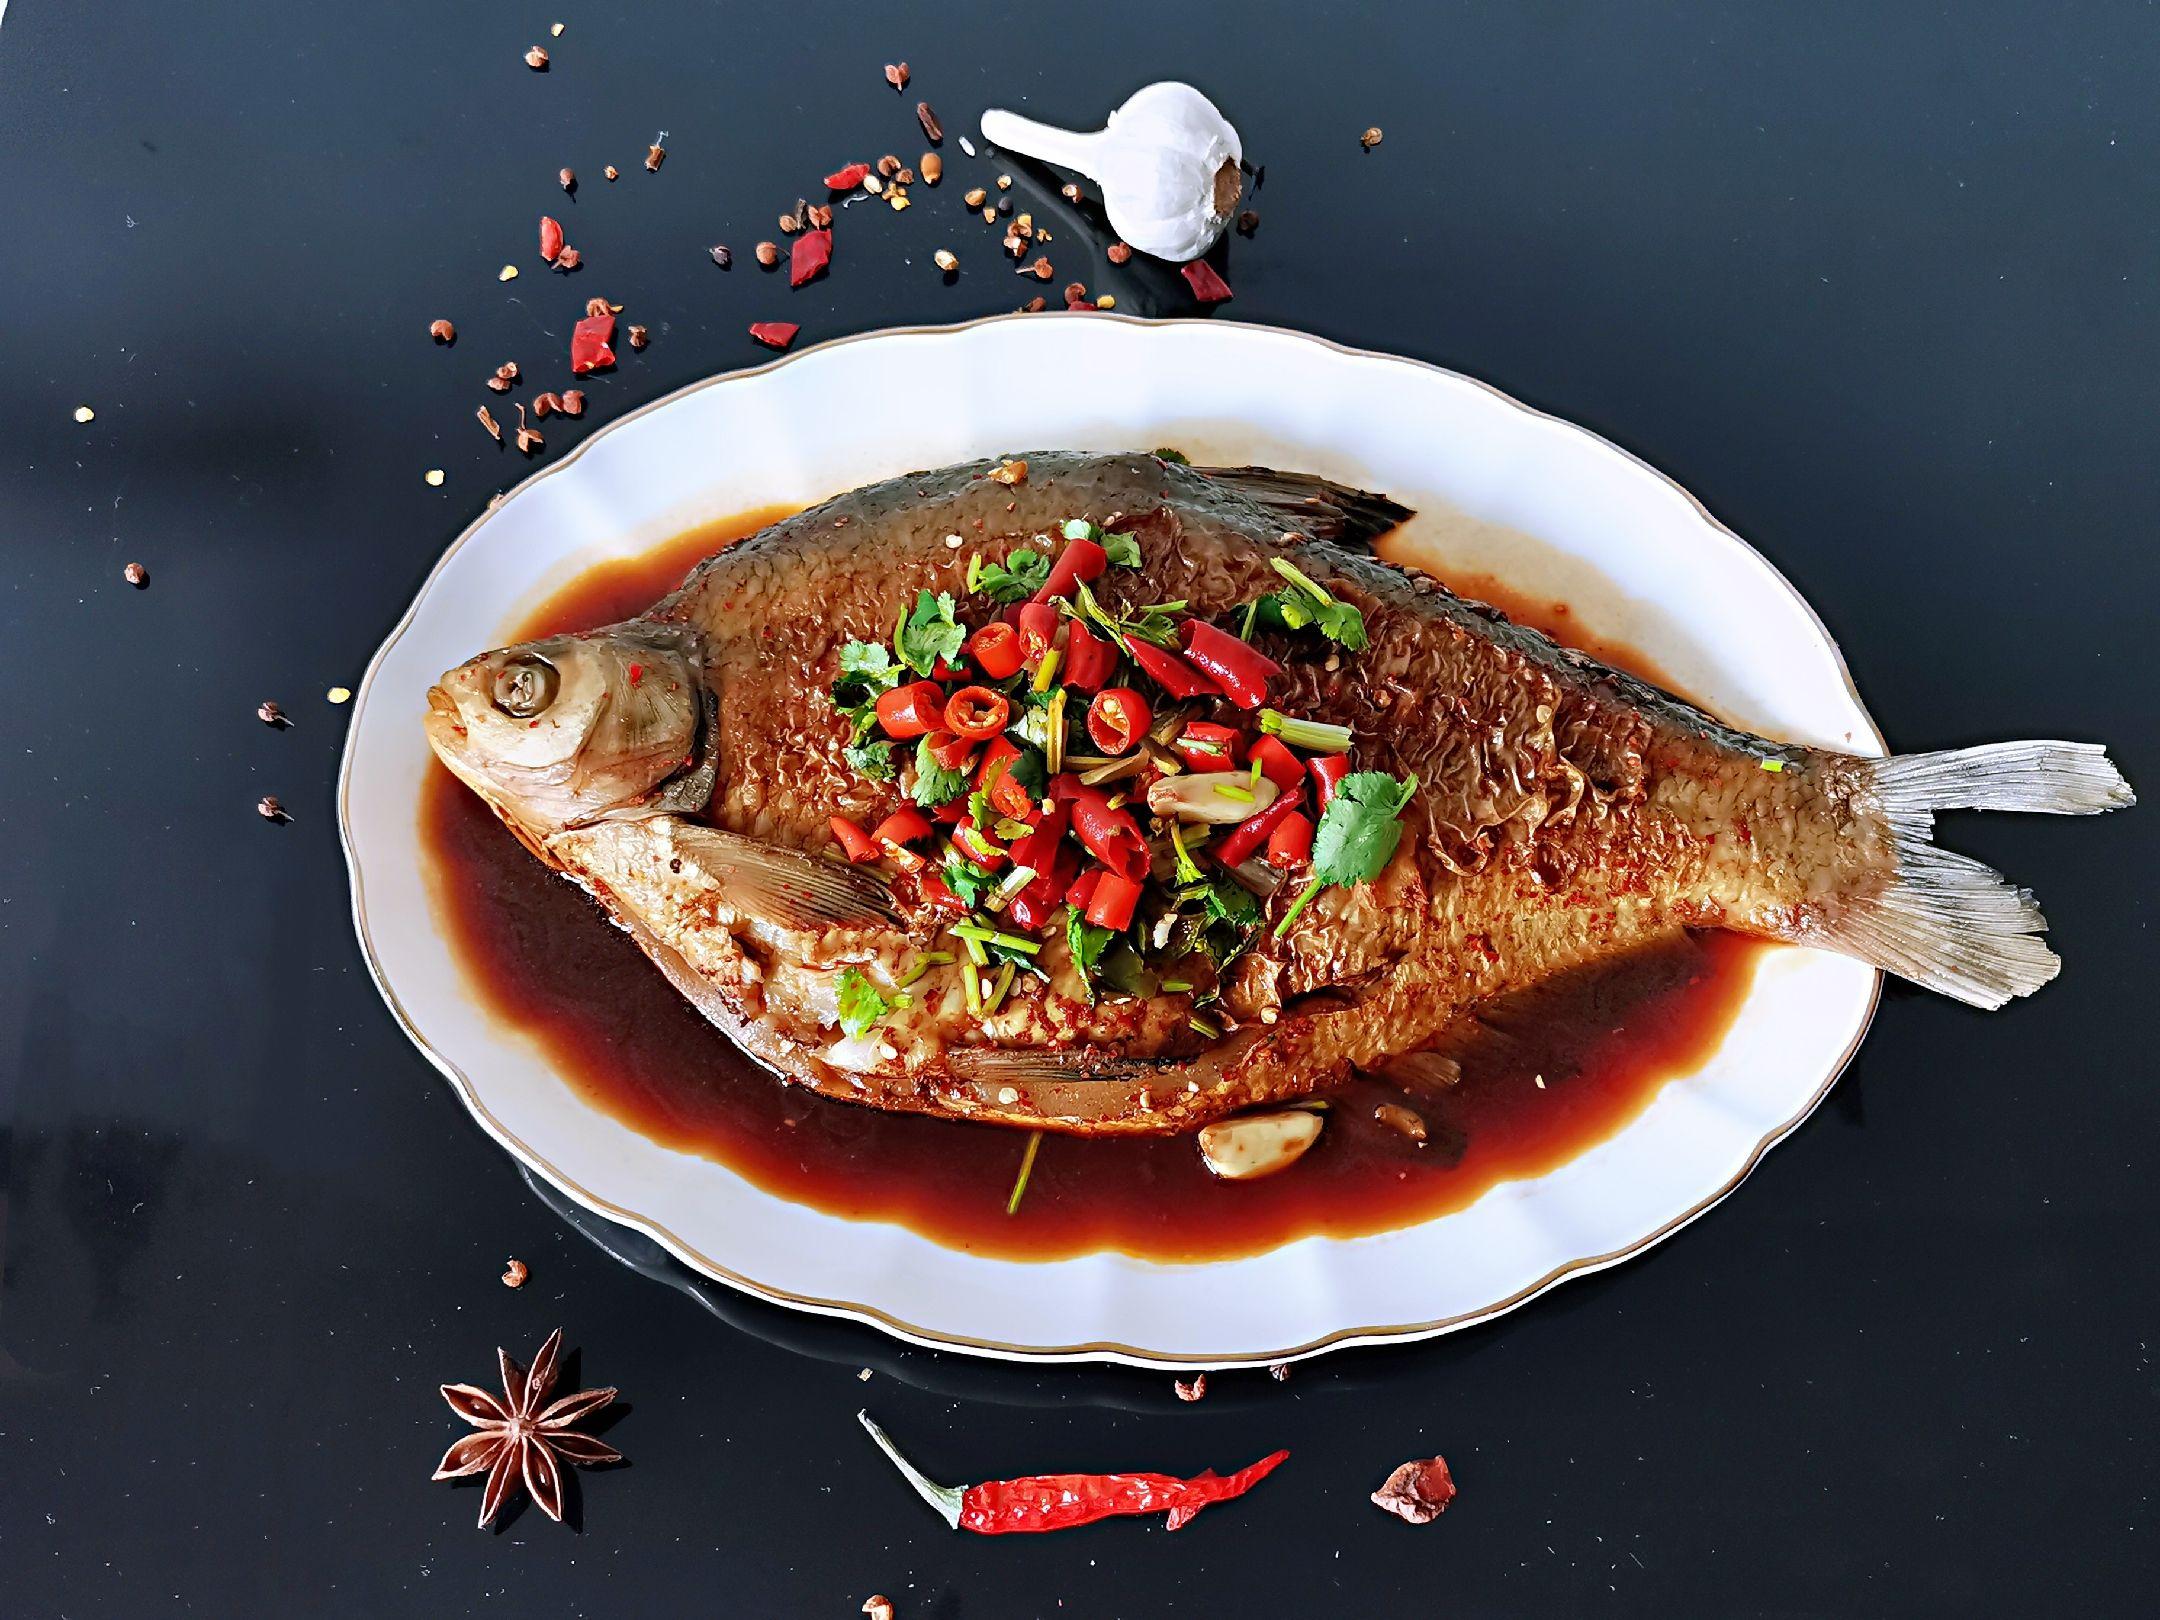 ㊙️无敌好吃的红烧鳊鱼成品图